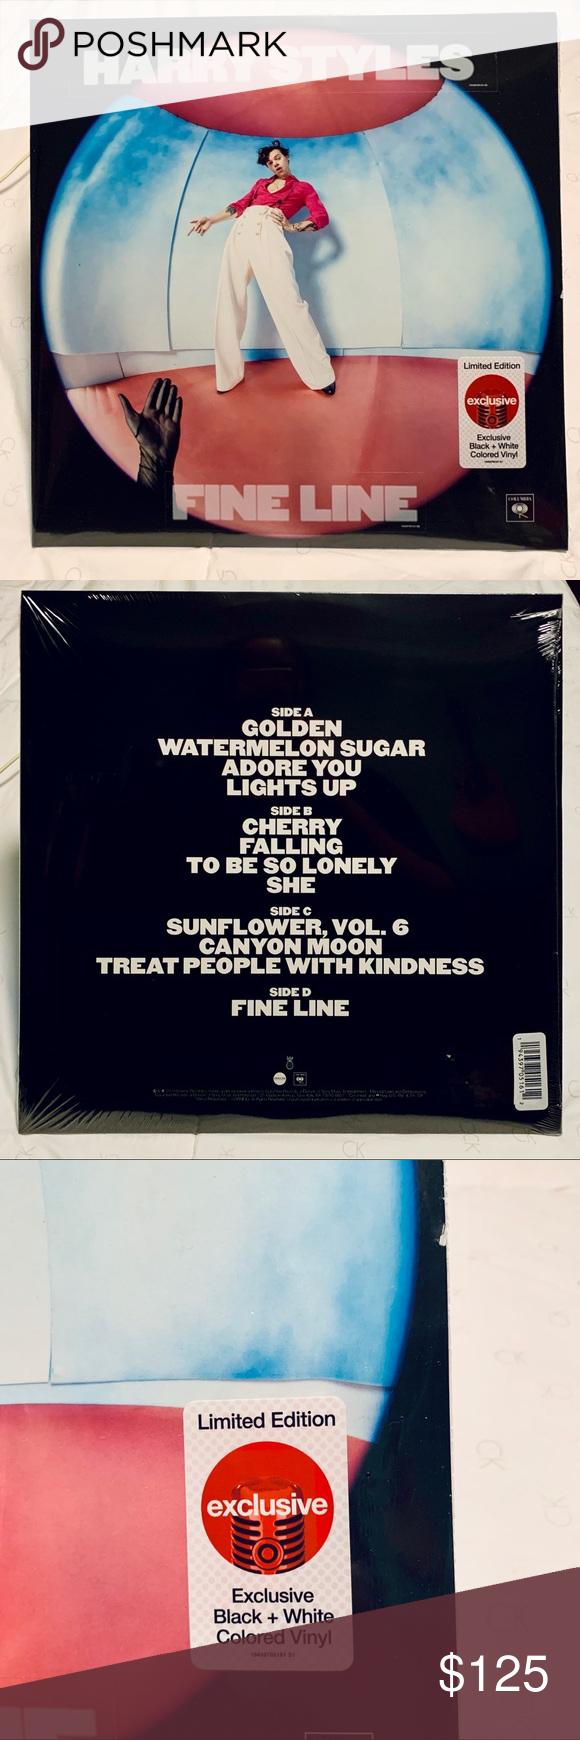 Harry Styles Fine Line Target Vinyl Record Lp In 2020 Harry Styles Poster Harry Styles Vinyl Records